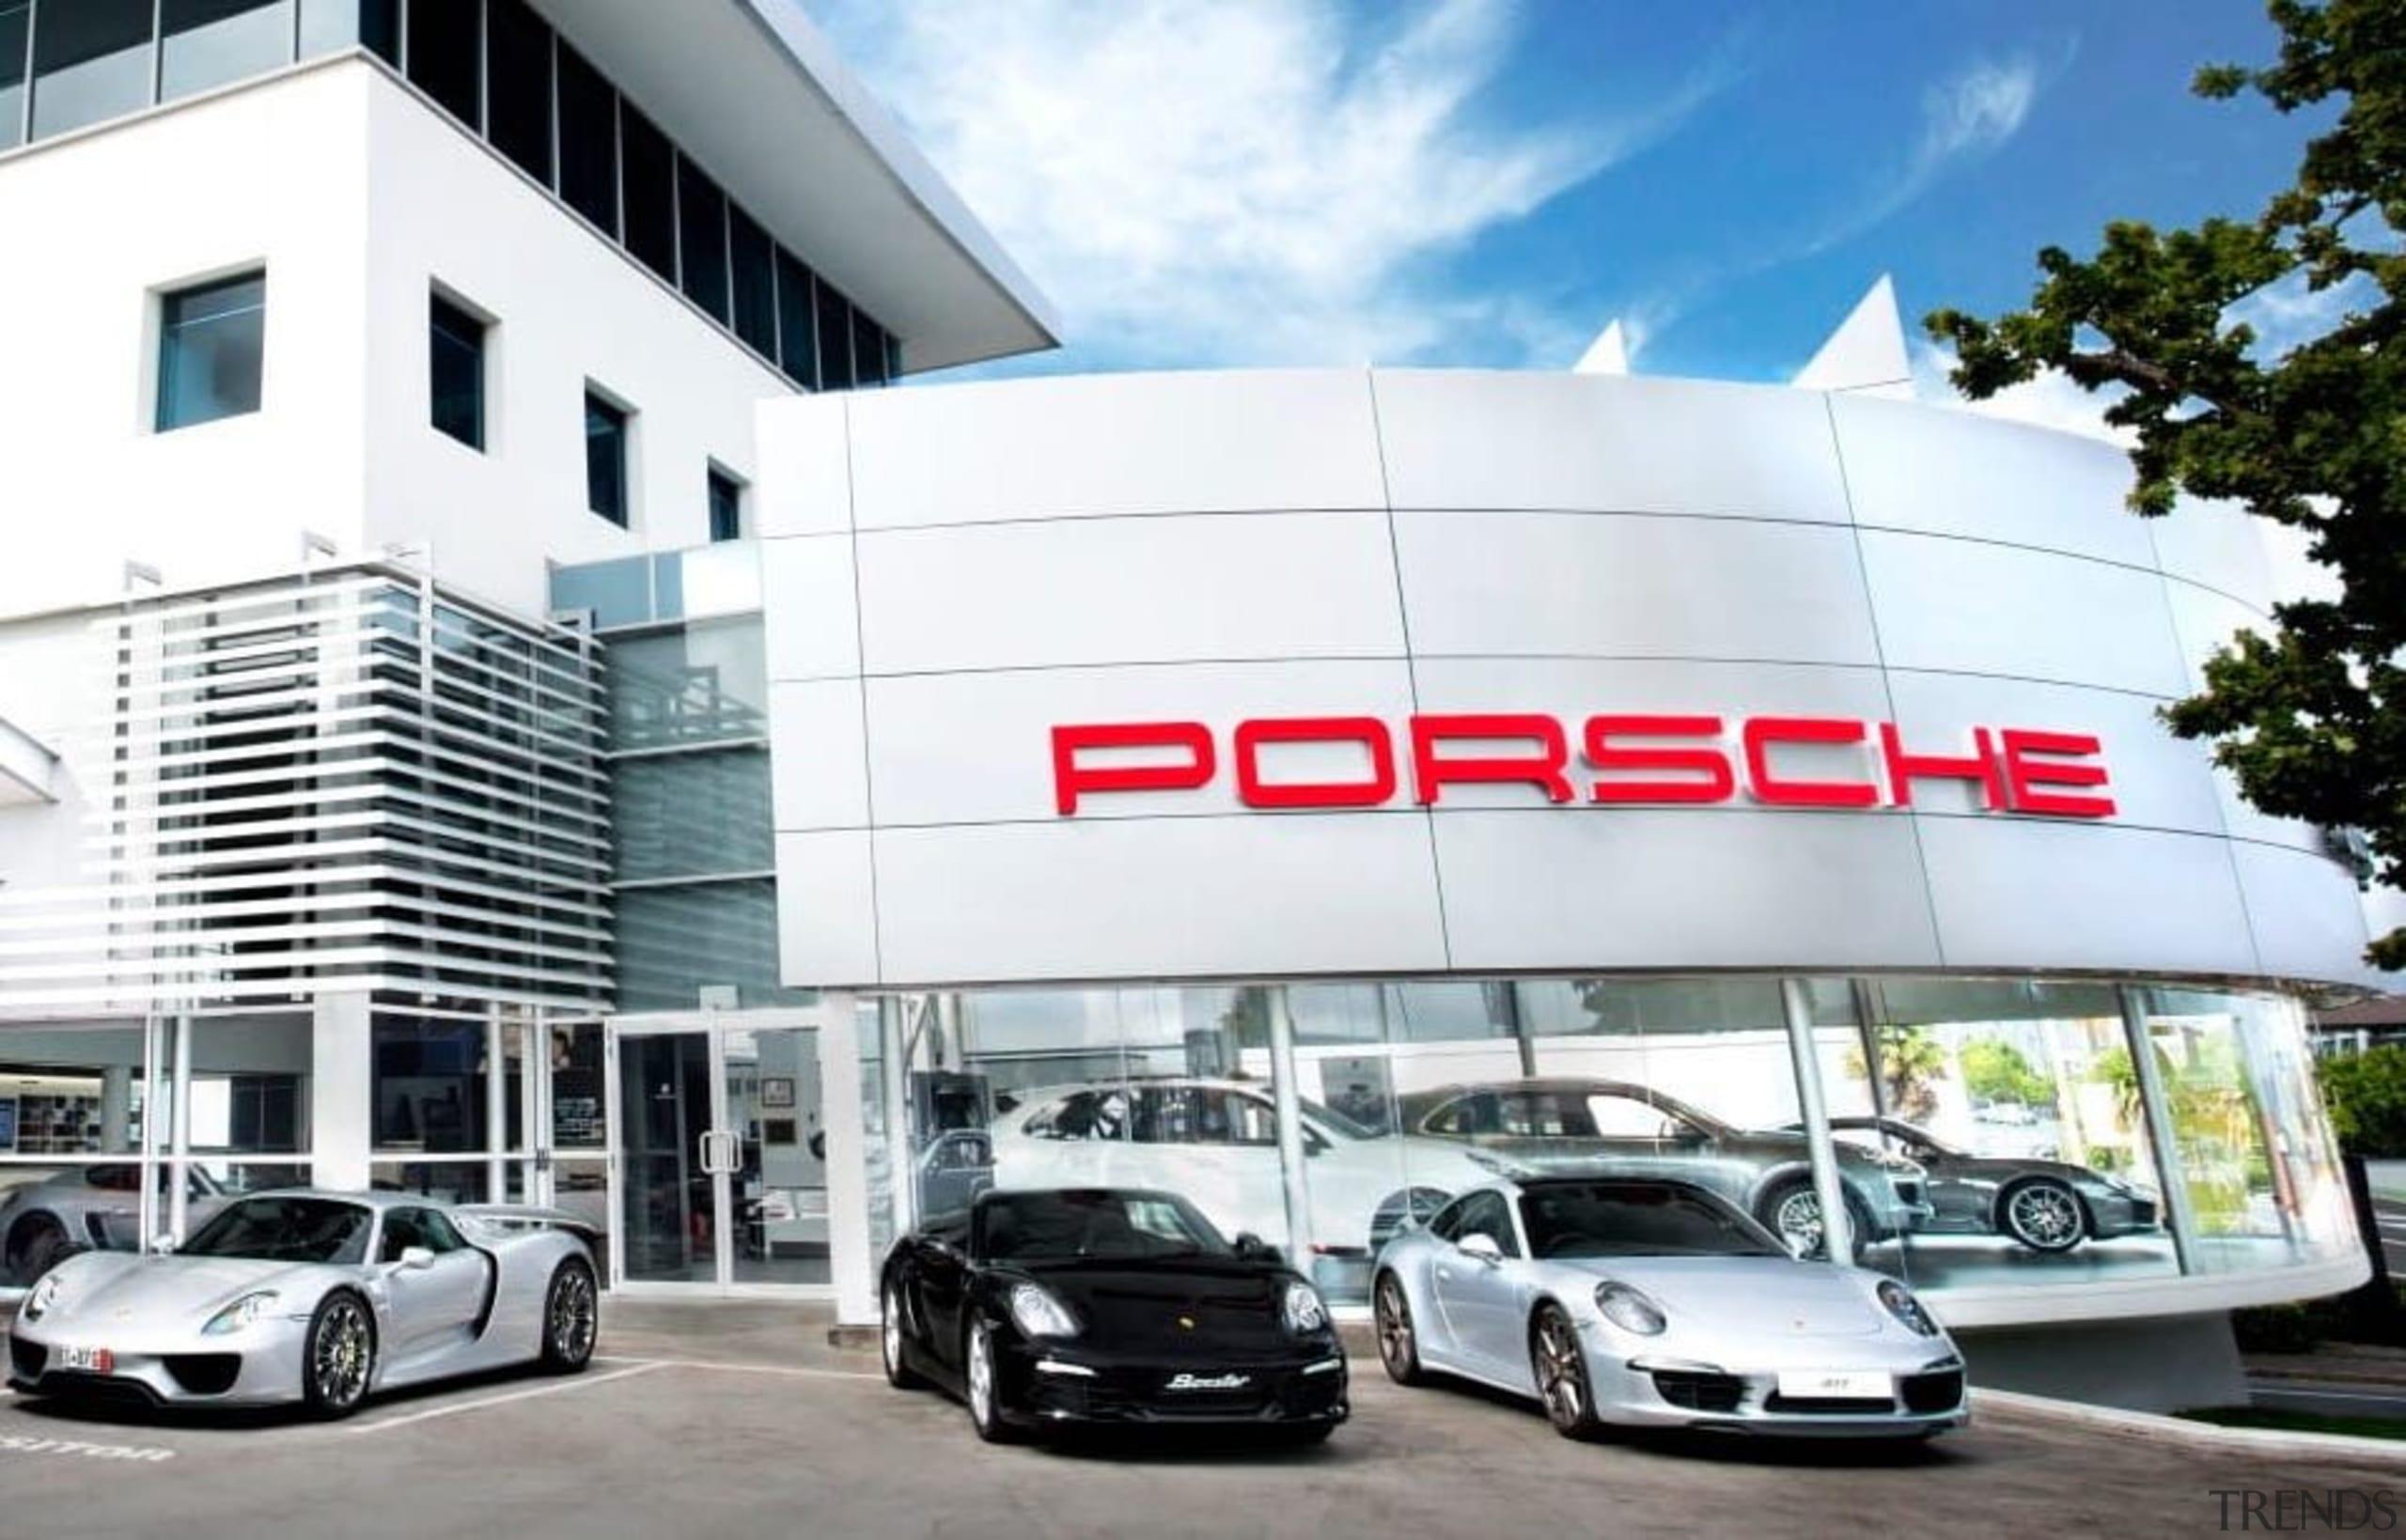 Dealership - architecture | automotive design | building architecture, automotive design, building, car, car dealership, land vehicle, luxury vehicle, porsche, sports car, supercar, vehicle, white